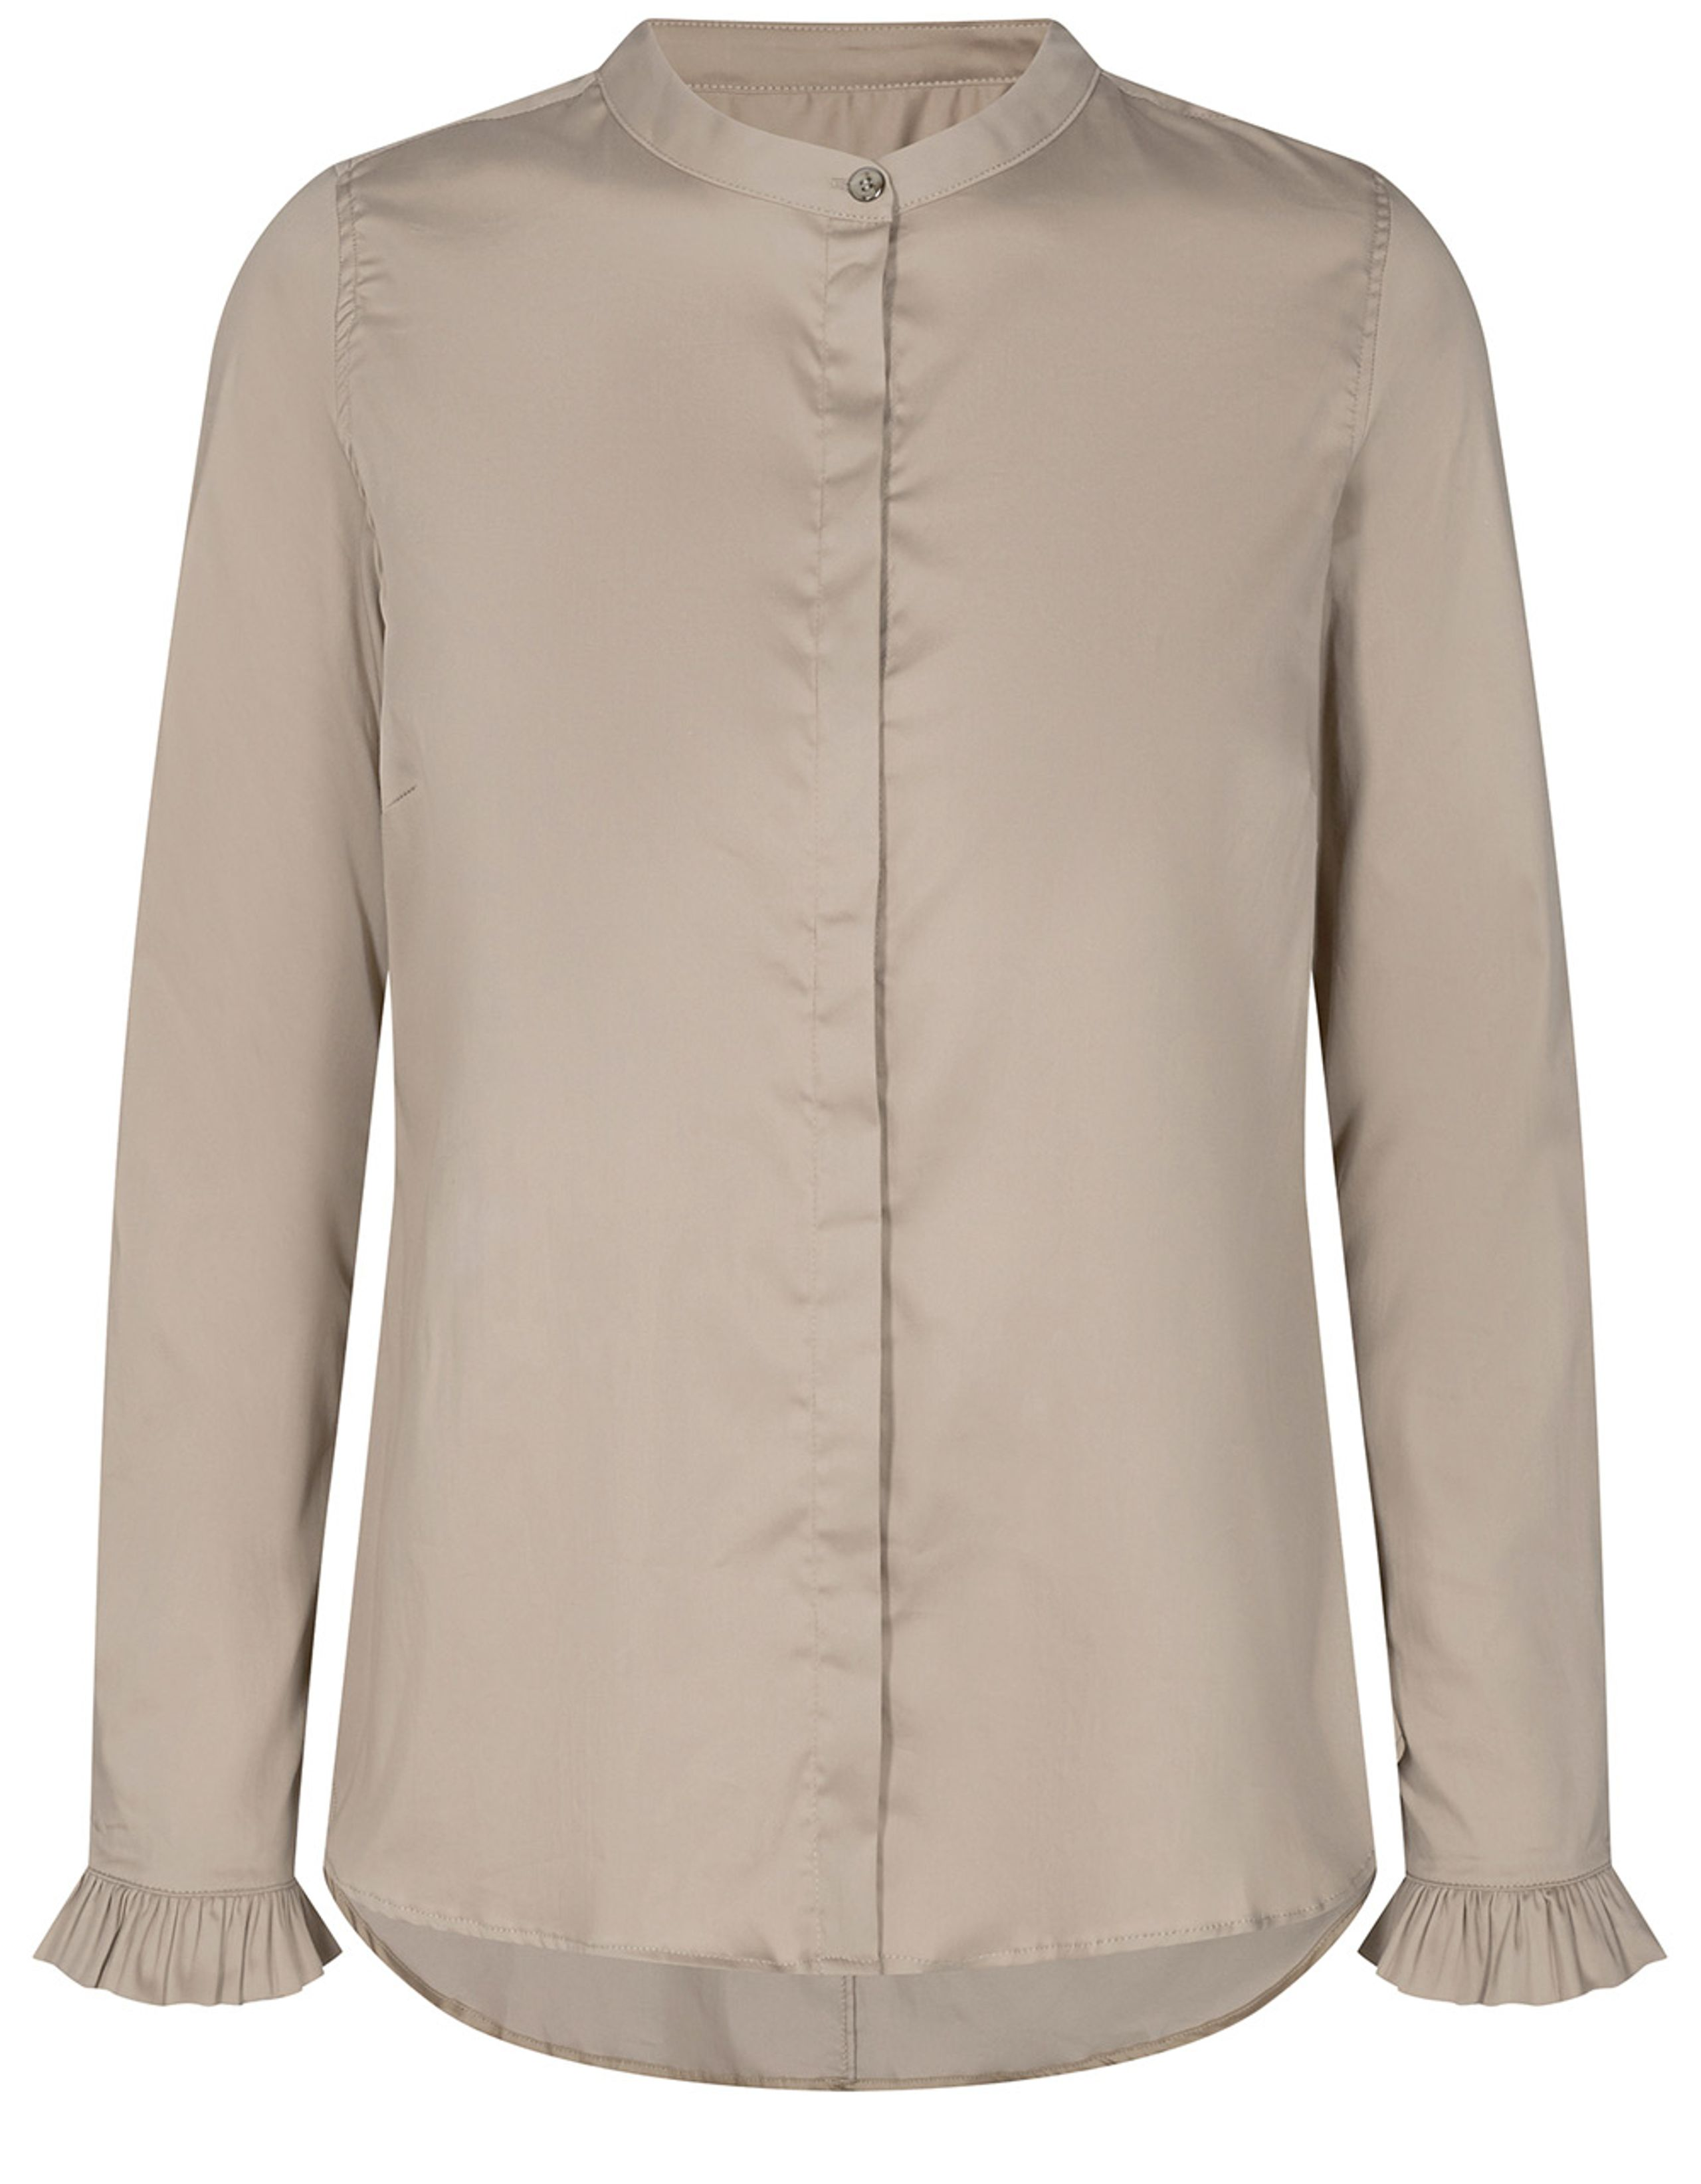 Blus, Mos Mosh, Mattie Sustainable Shirt, Light Taupe